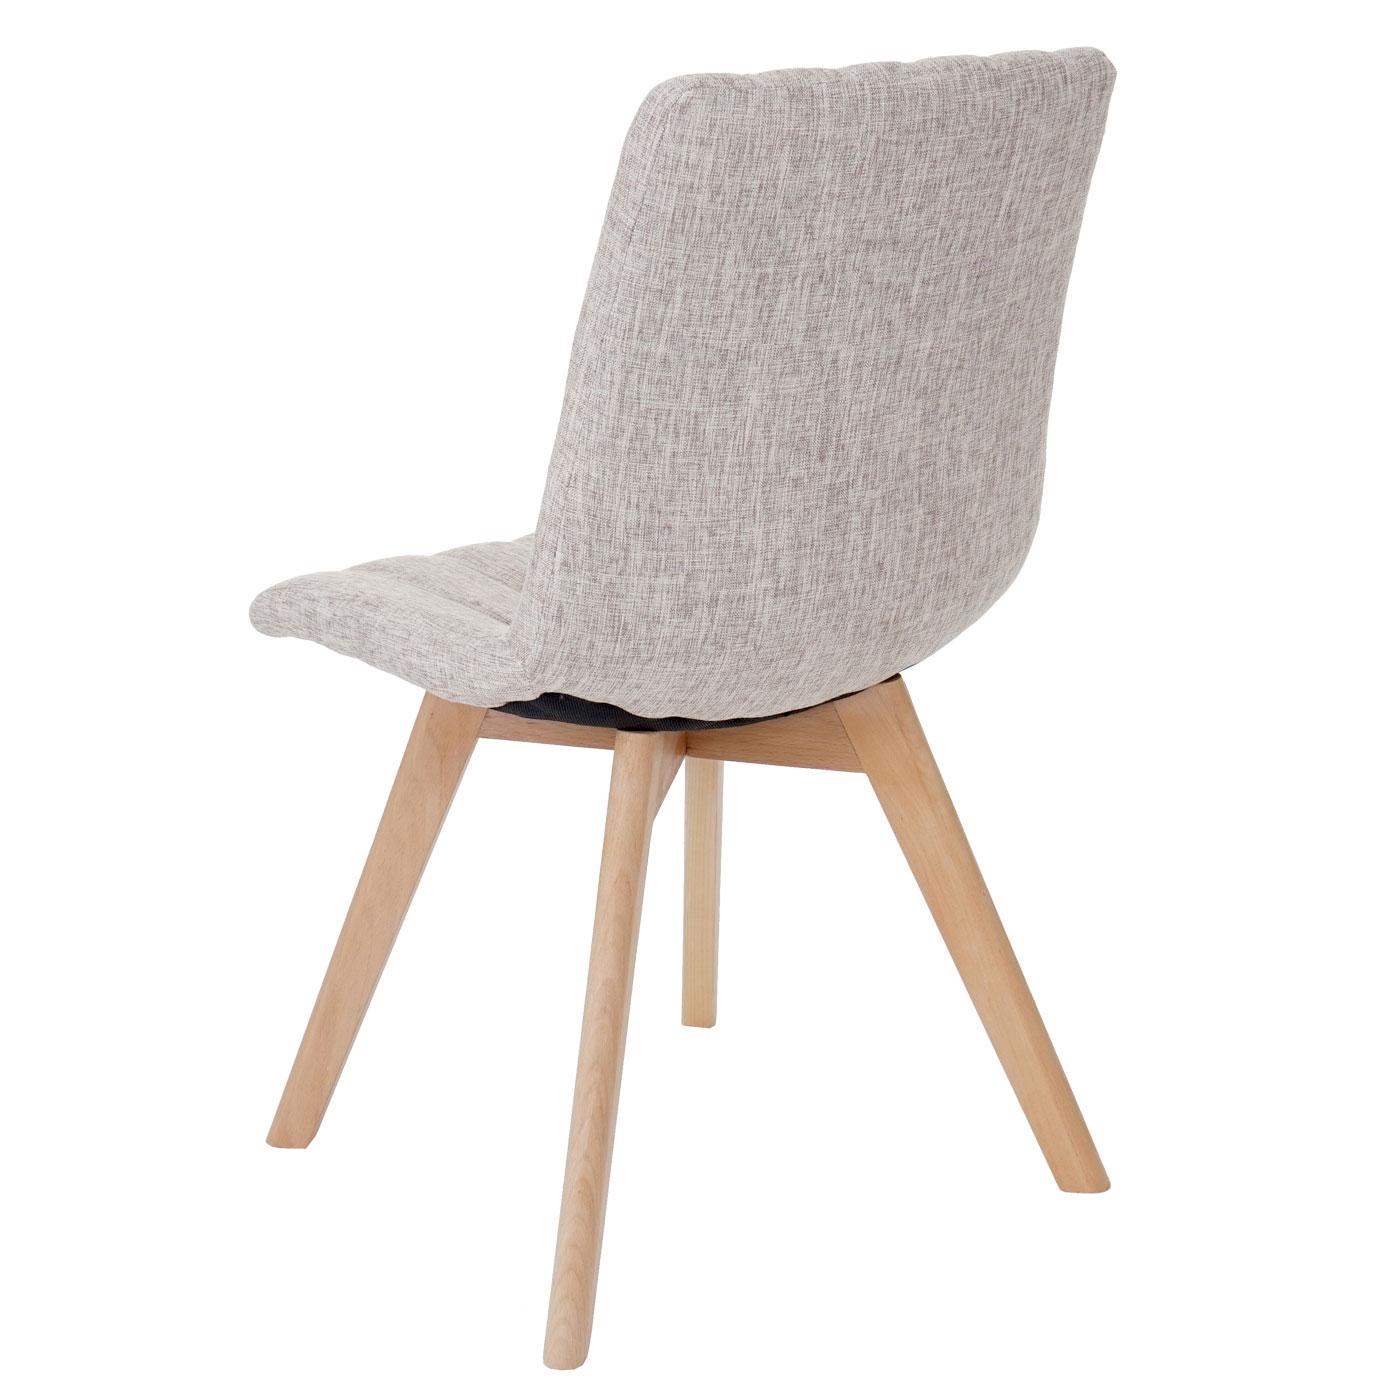 2x chaise de salle manger calgary fauteuil design r tro tissu cr me ebay. Black Bedroom Furniture Sets. Home Design Ideas